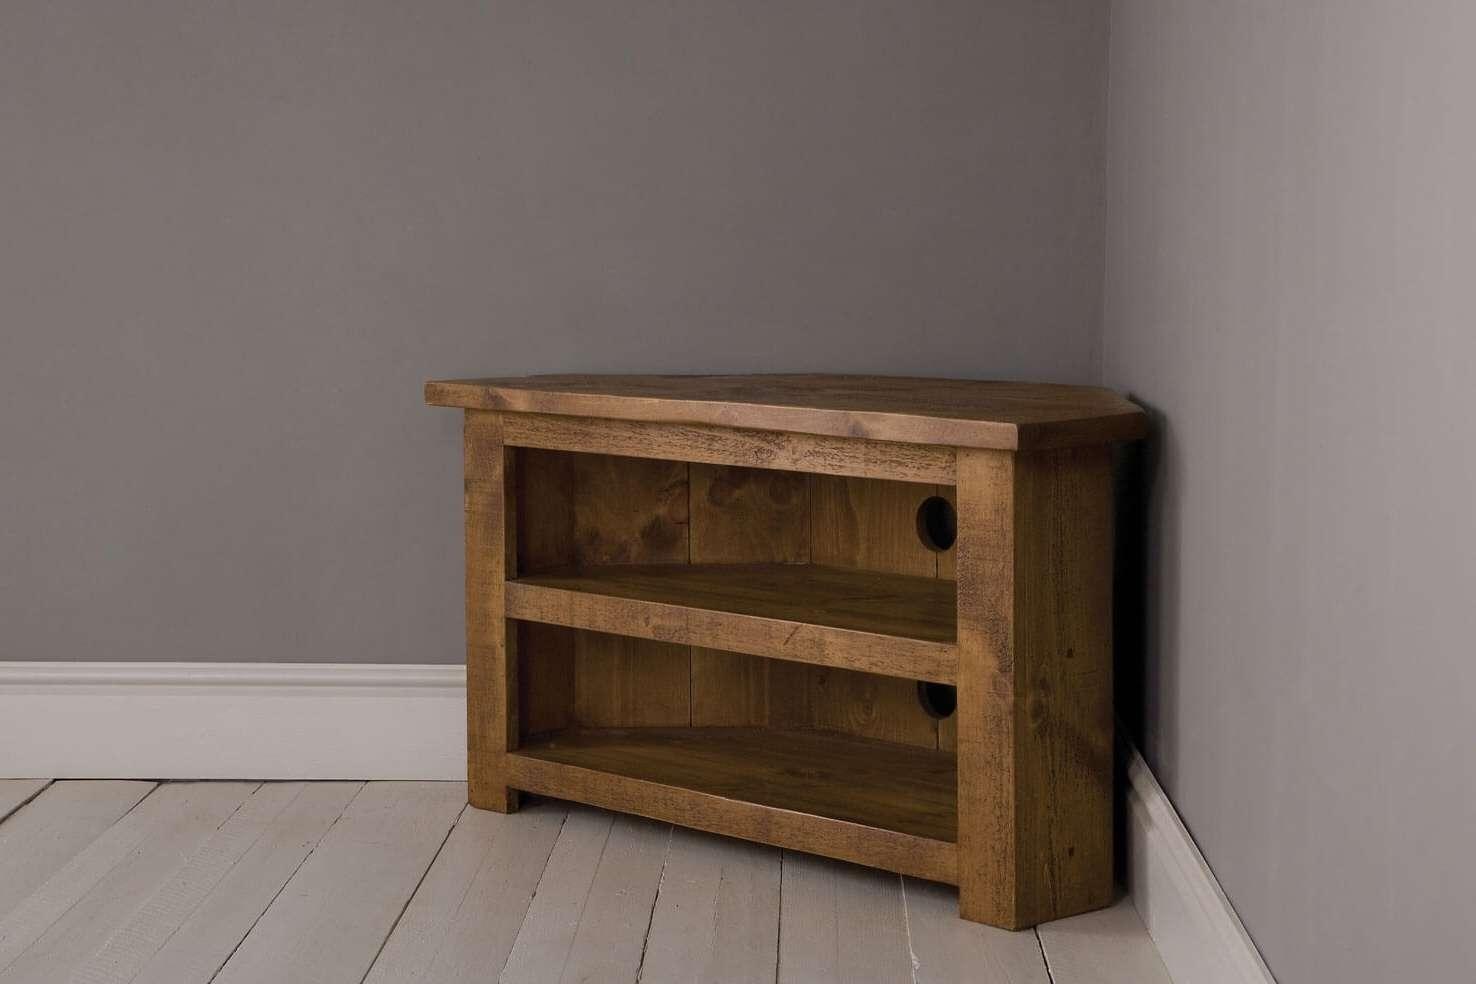 Plank Corner Tv Unit With Shelfindigo Furniture Inside Large Corner Tv Cabinets (View 13 of 20)